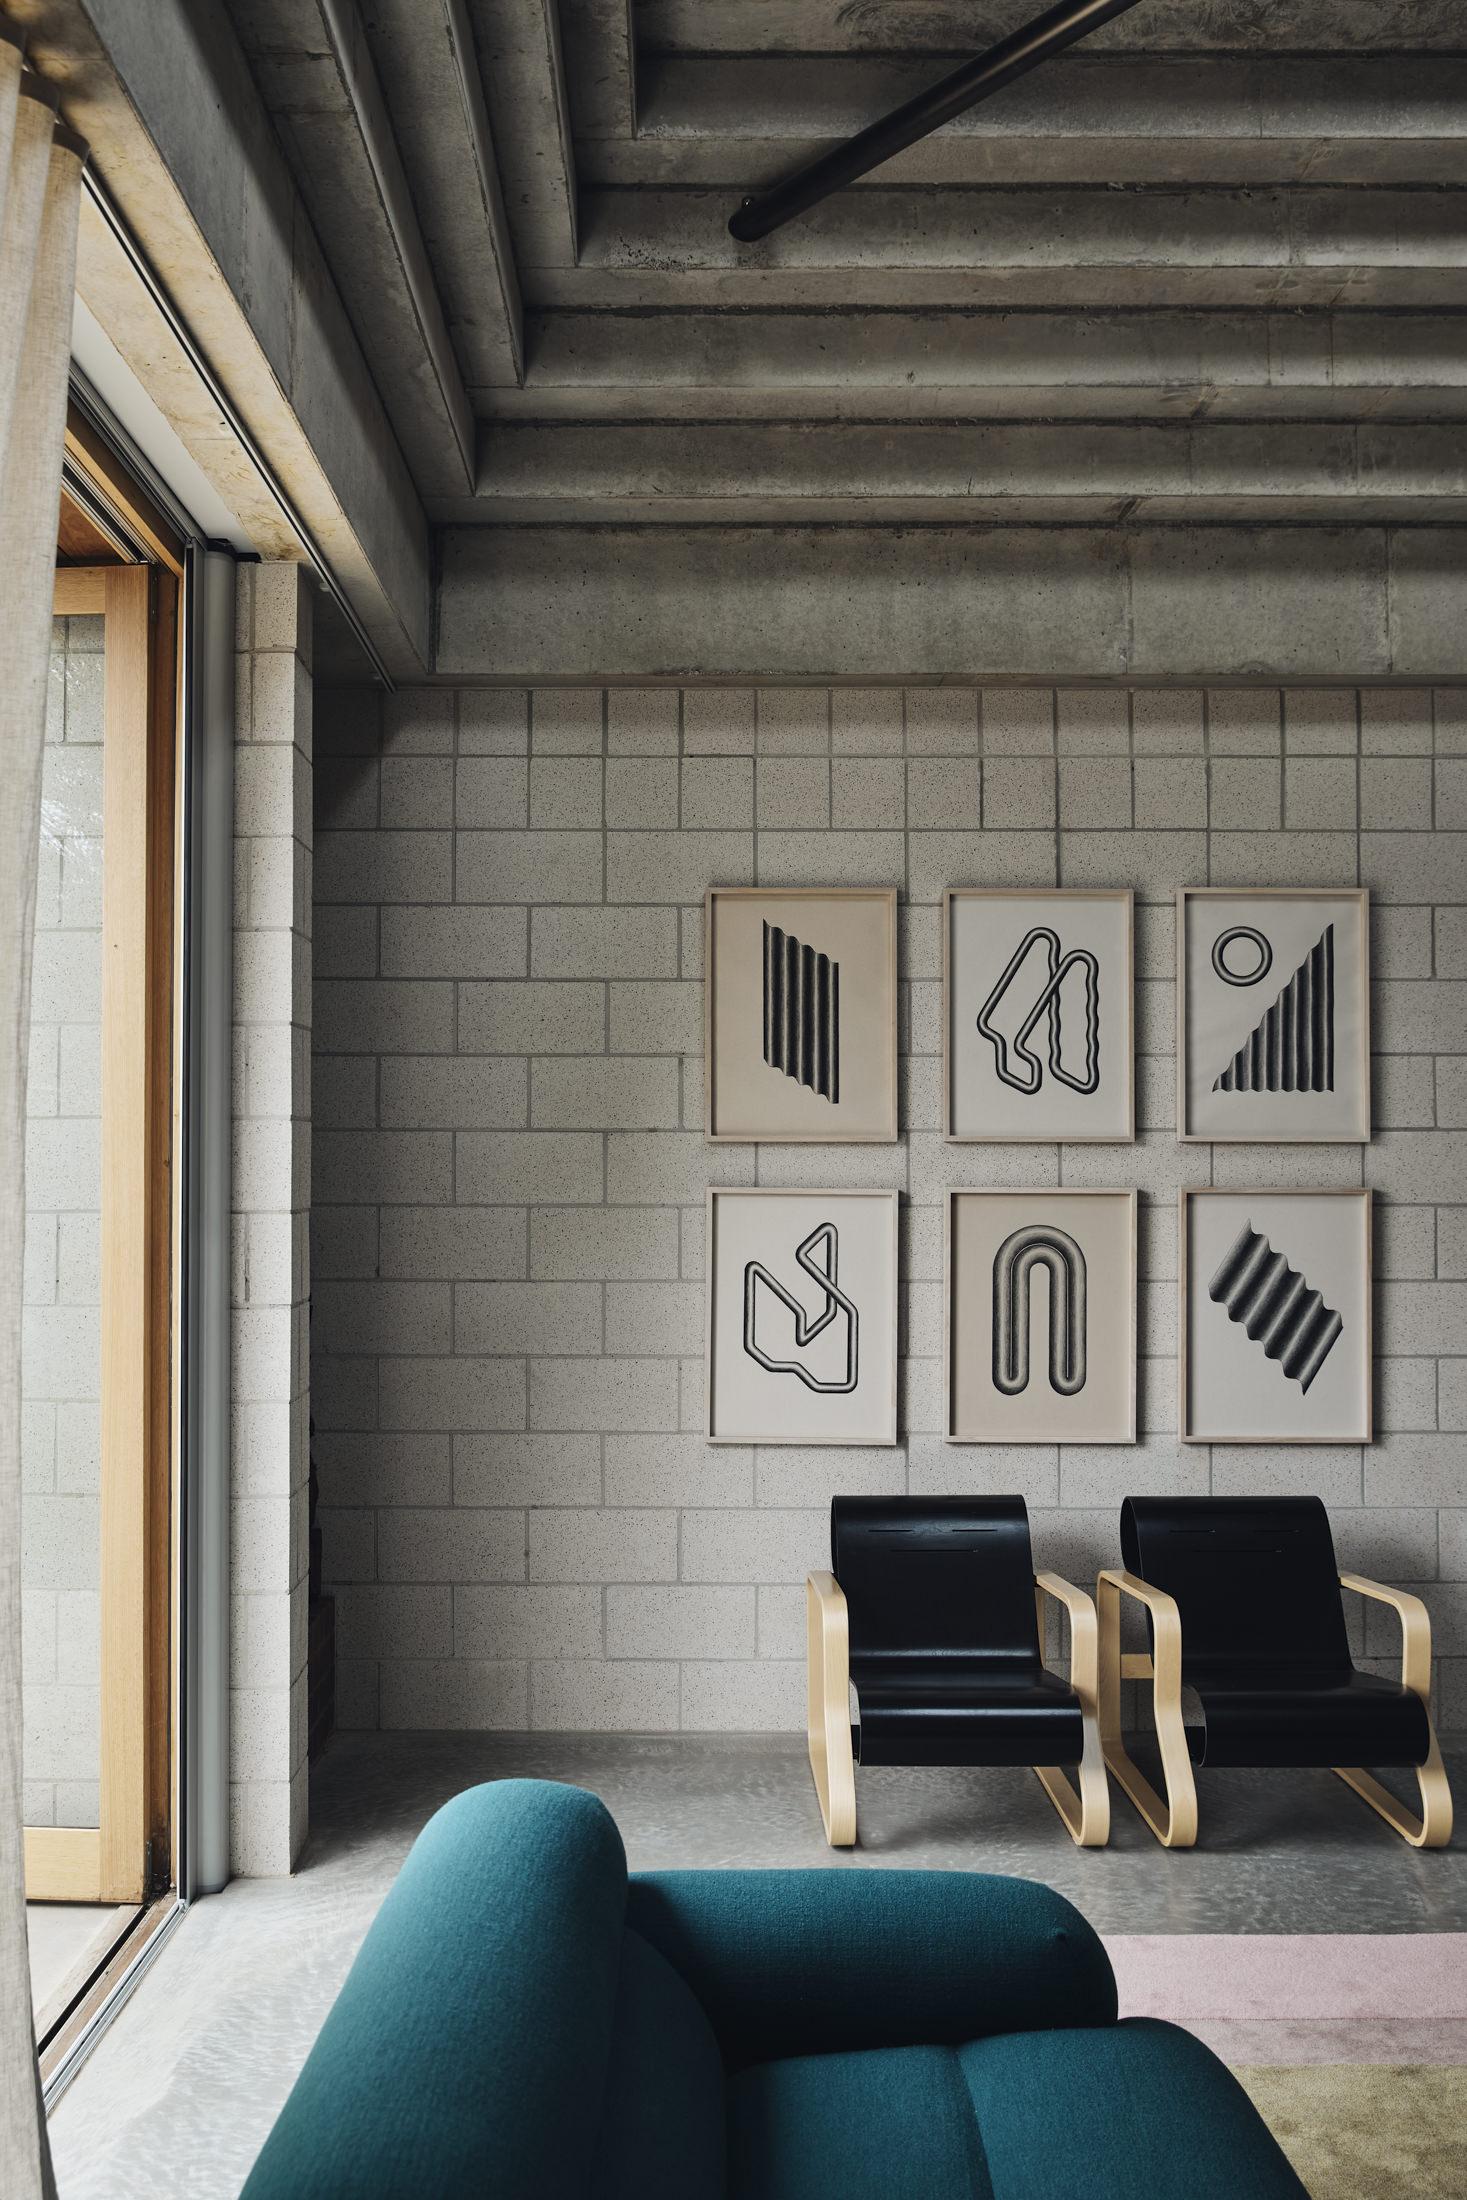 Architects Eat Bellows Beach House Flinders Masonry Architecture Photo Derek Swalwell Yellowtrace 19